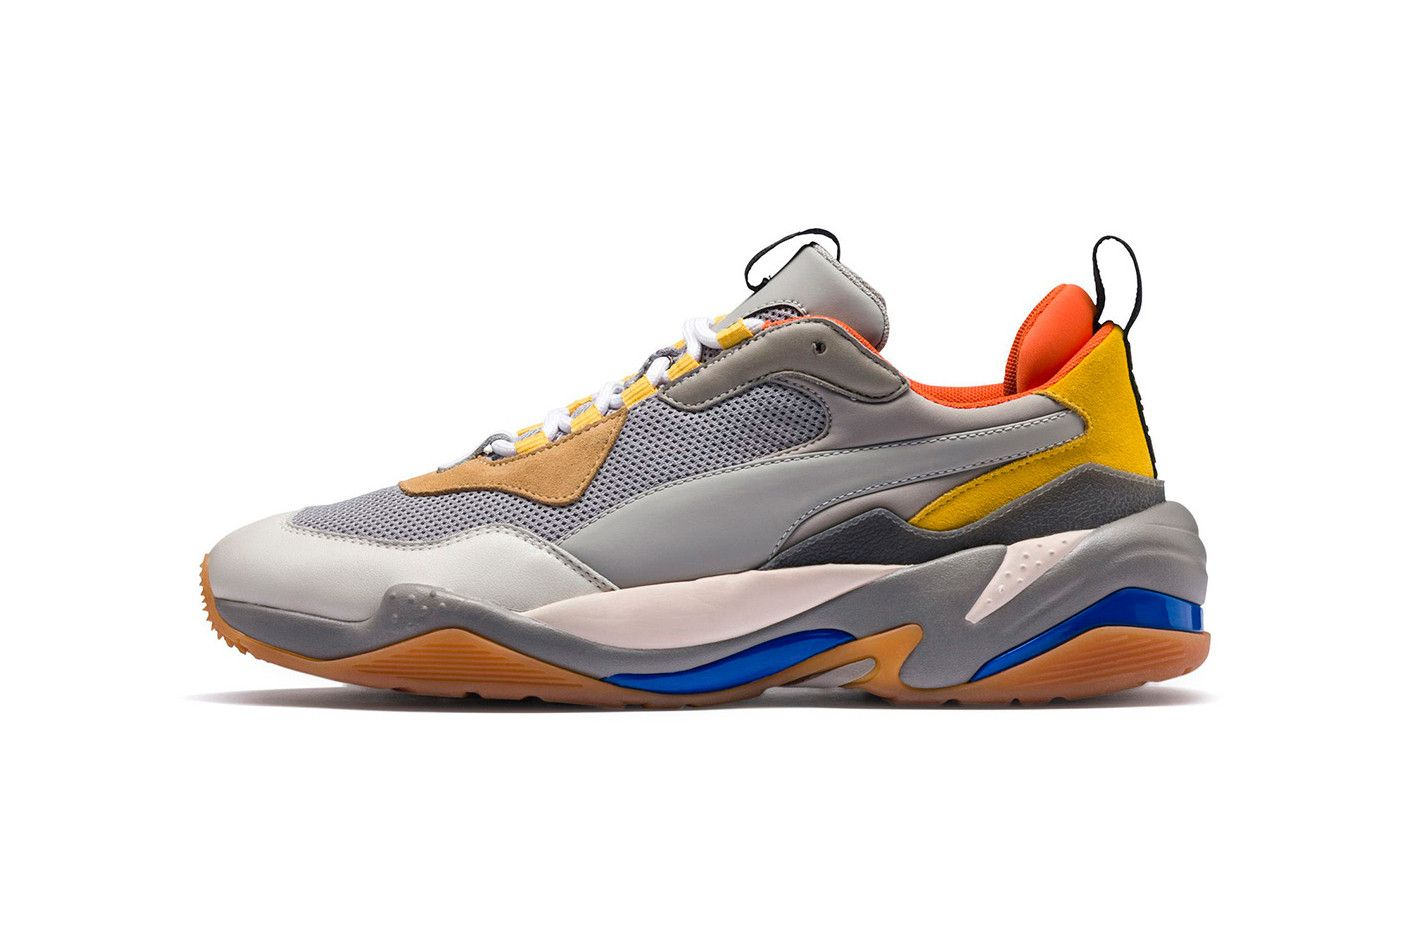 8a31d670fcc PUMA Thunder Spectra Grey orange Yellow Blue August 2018 release date info  drop sneakers shoes footwear